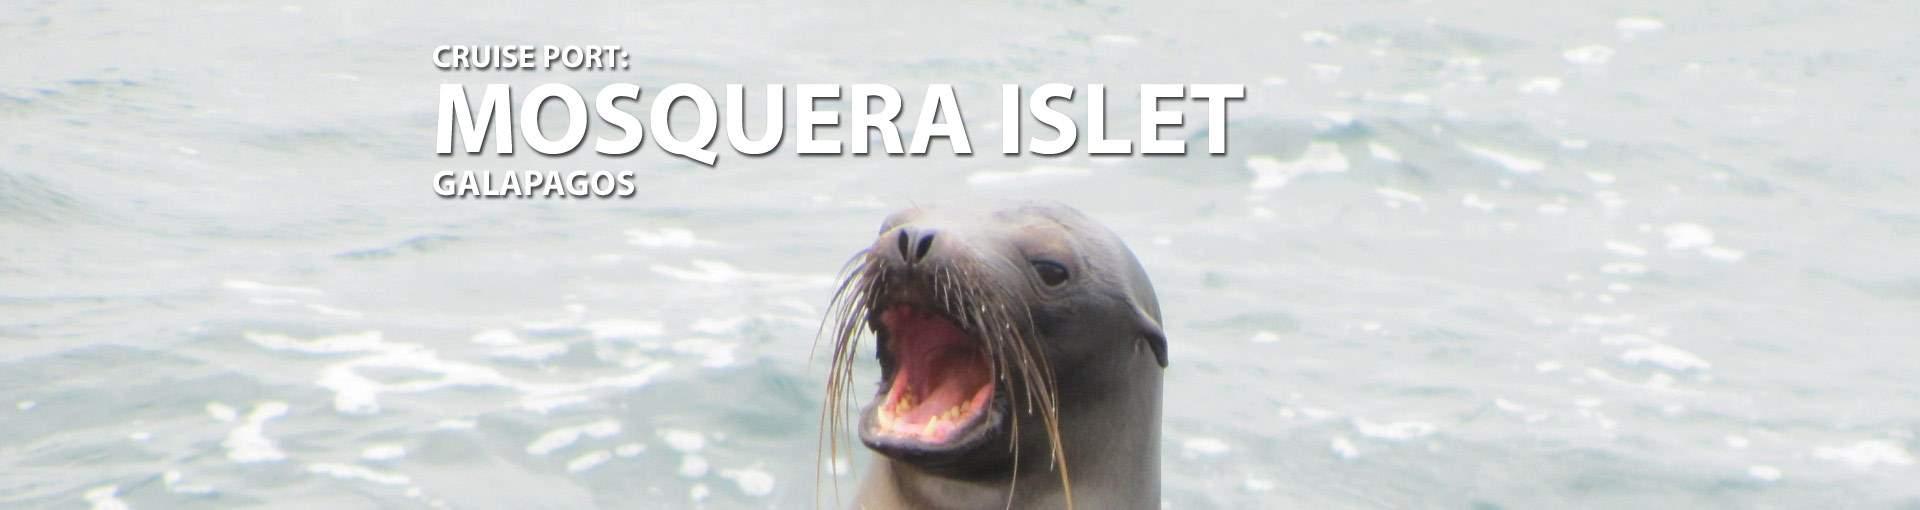 Mosquera Islet, Galapagos Cruise Port